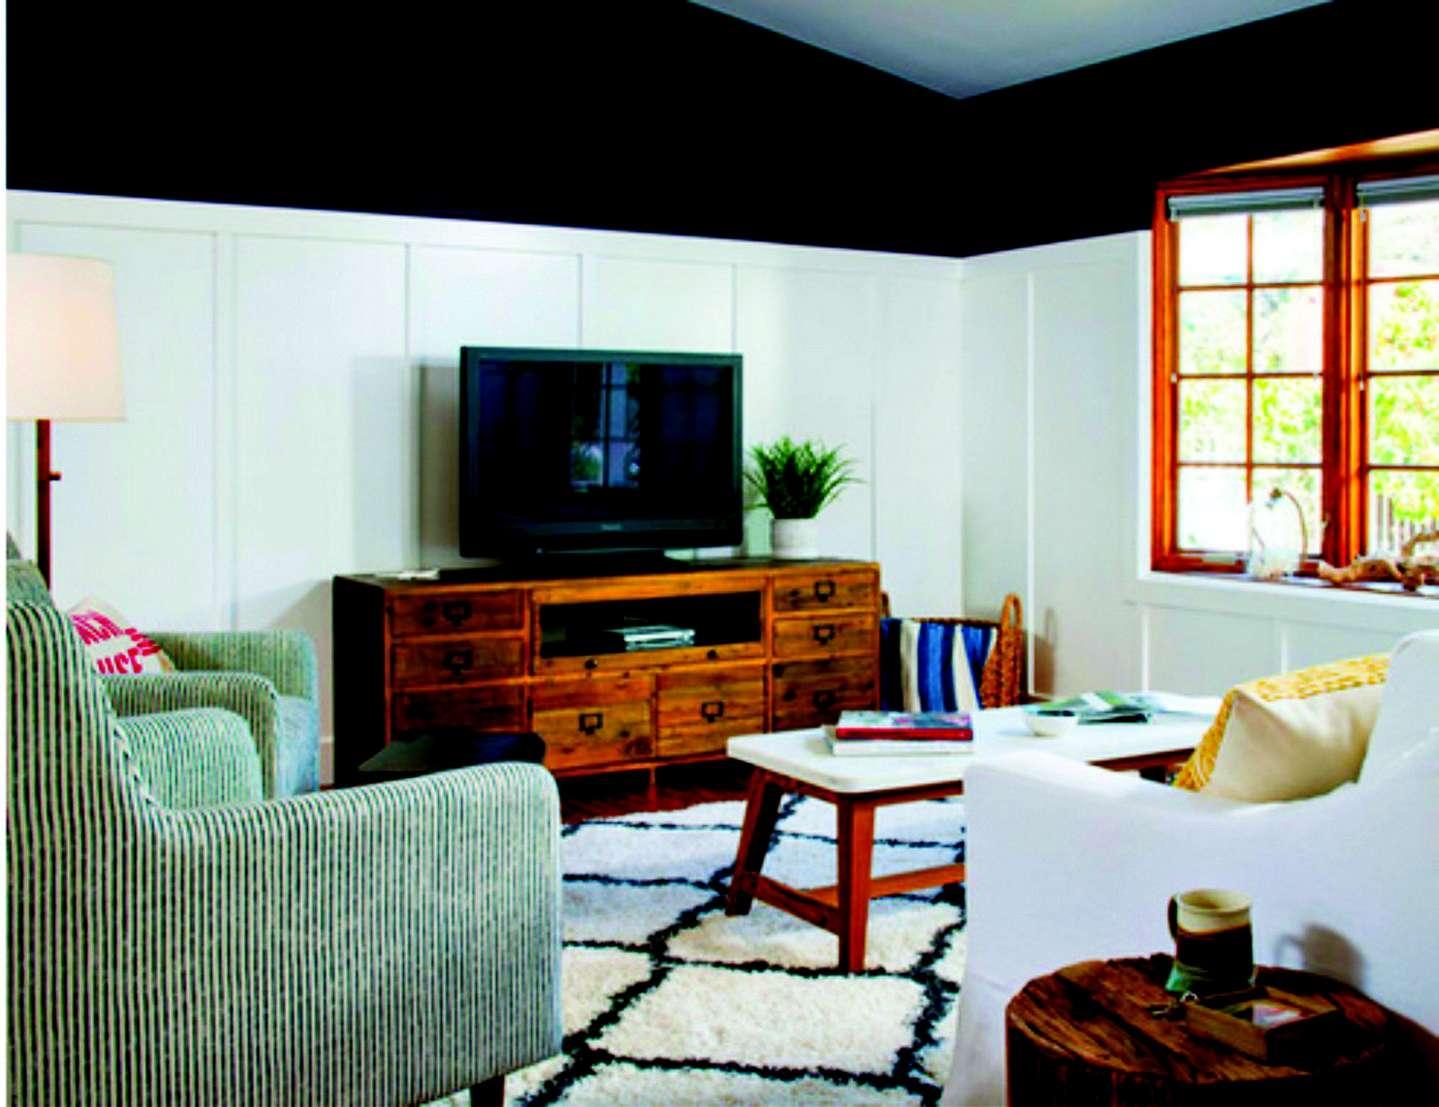 Tv : Playroom Tv Stands Pleasant Playroom Tv Stands' Exquisite Inside Playroom Tv Stands (View 11 of 15)